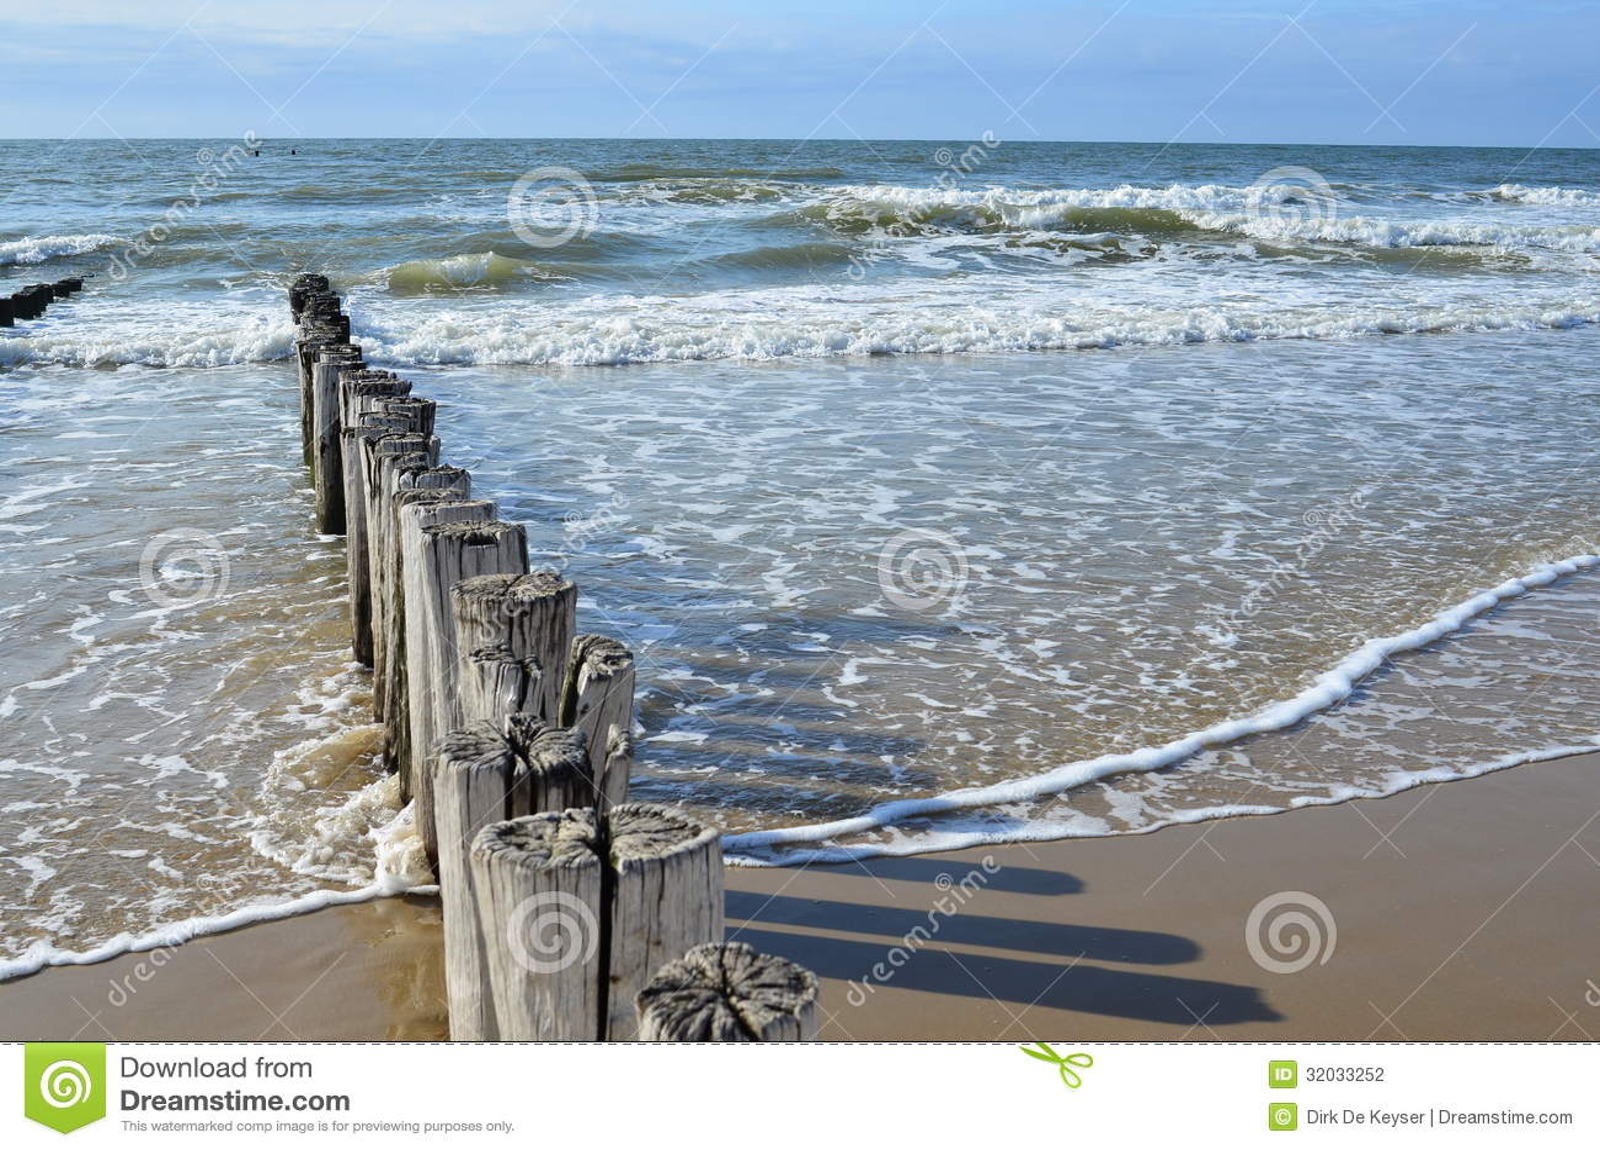 wellenbrecher auf dem strand in der nordsee in domburg holland stockfotografie bild 32033252. Black Bedroom Furniture Sets. Home Design Ideas